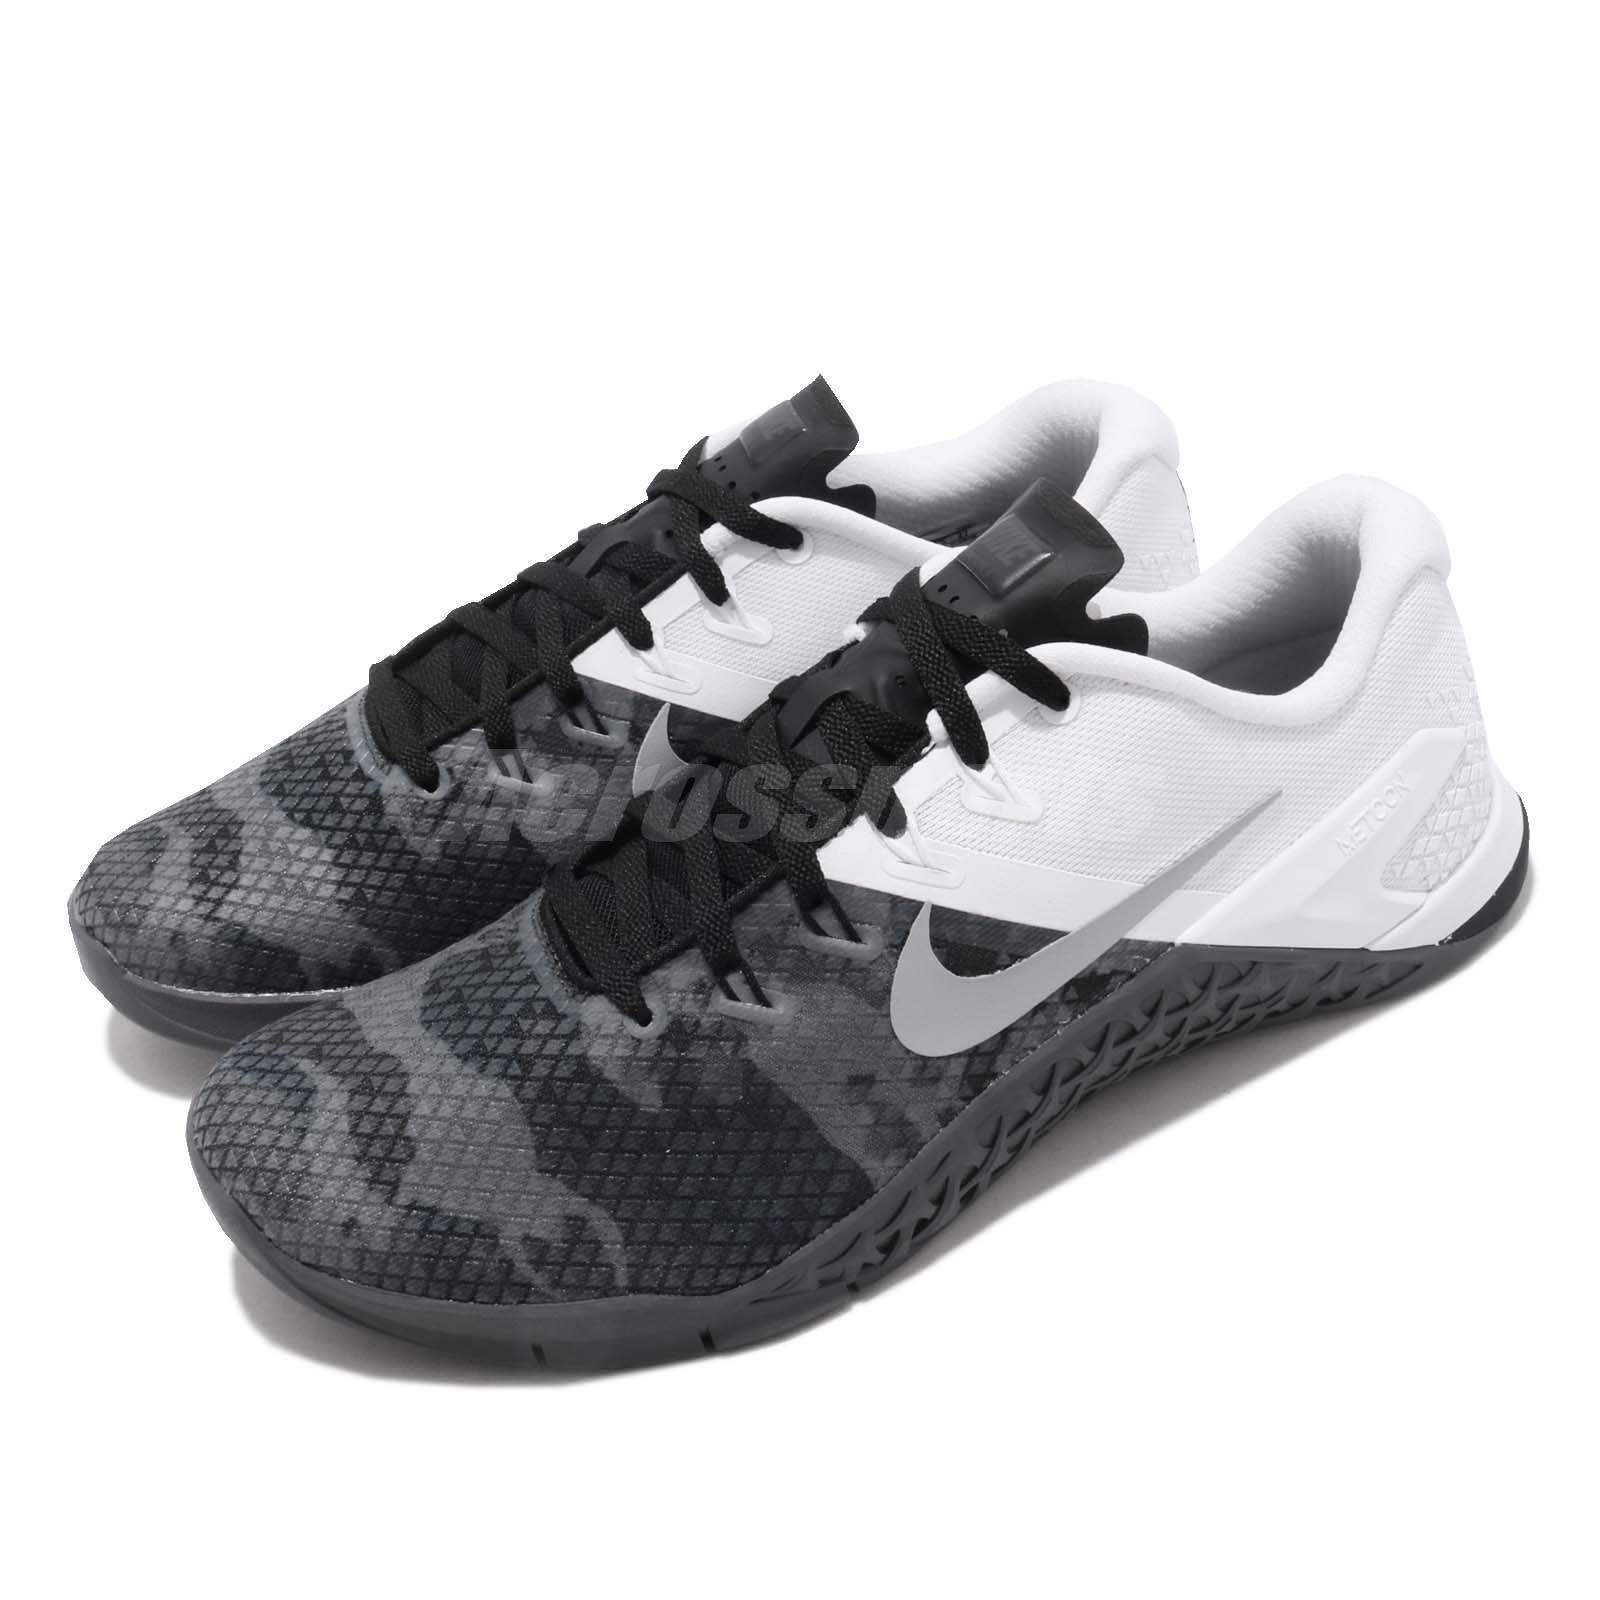 Nike Metcon 4 XD nero  grigio Men Cross Training Weight Lifting scarpe BV1636 -012  Offriamo vari marchi famosi